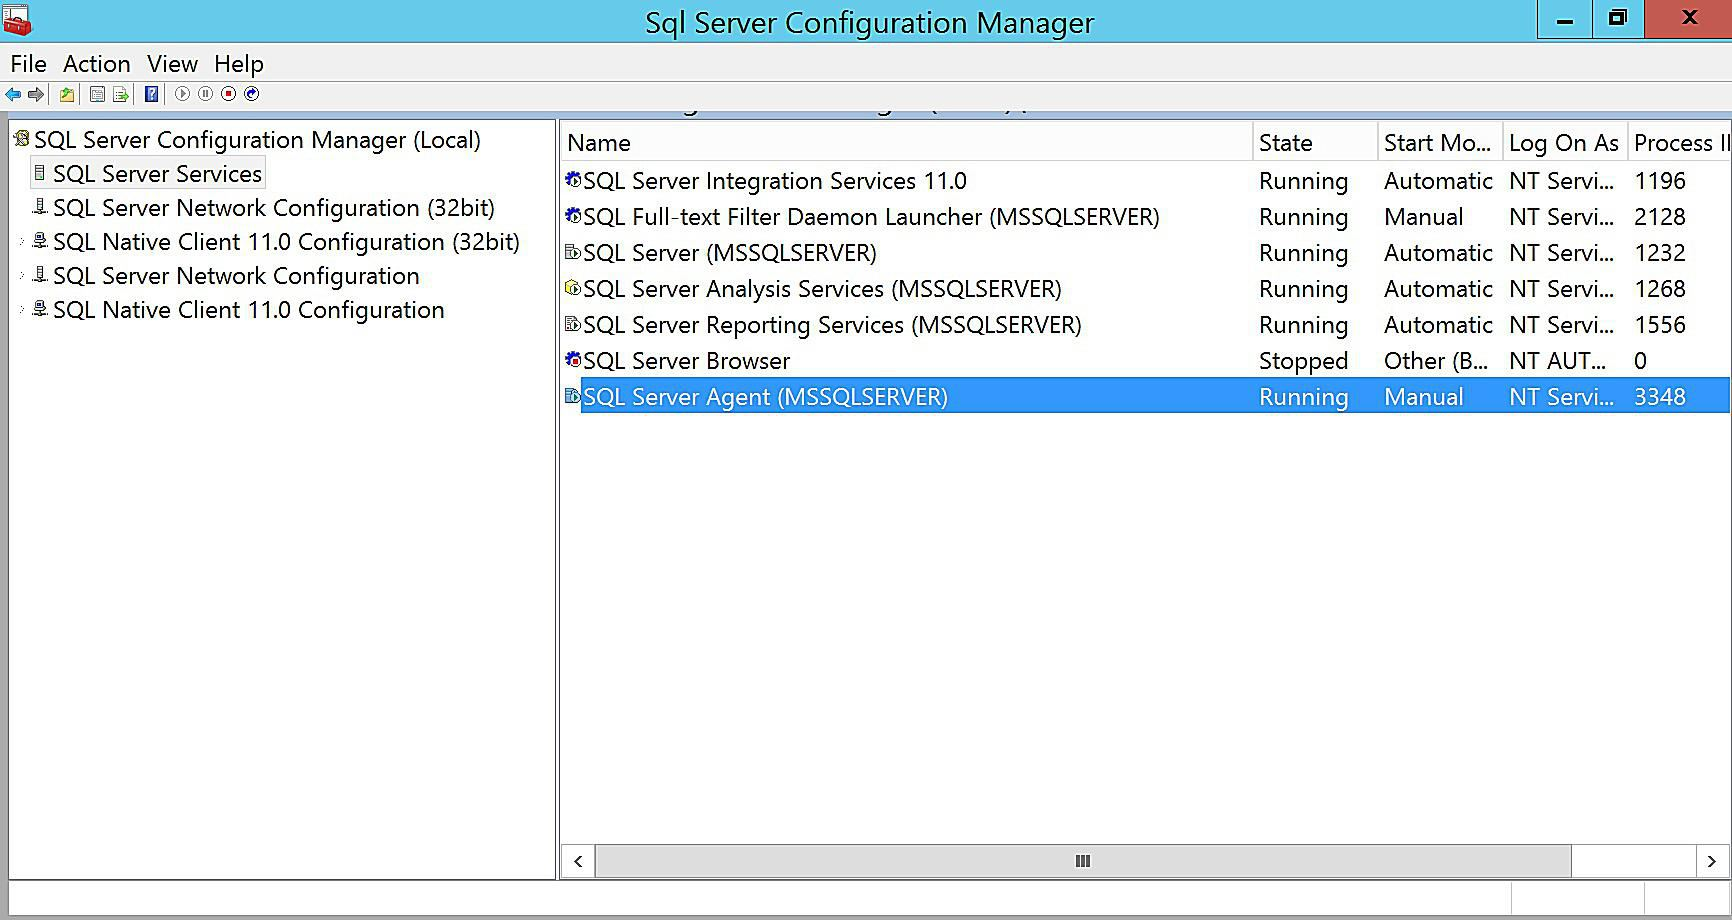 Configuring SQL Server Agent 2012